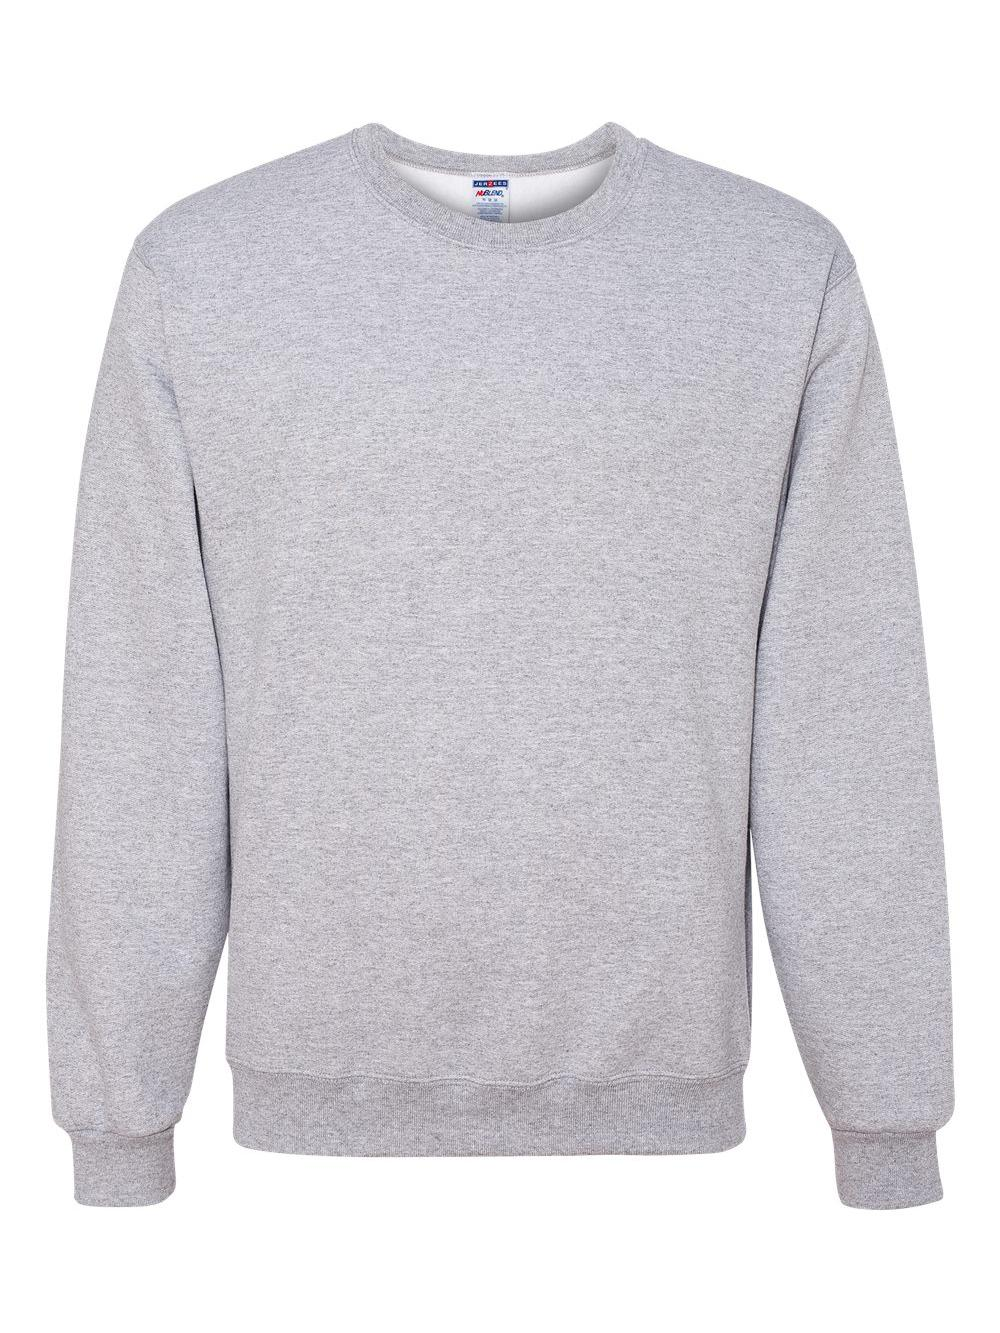 Jerzees-NuBlend-Crewneck-Sweatshirt-562MR thumbnail 3